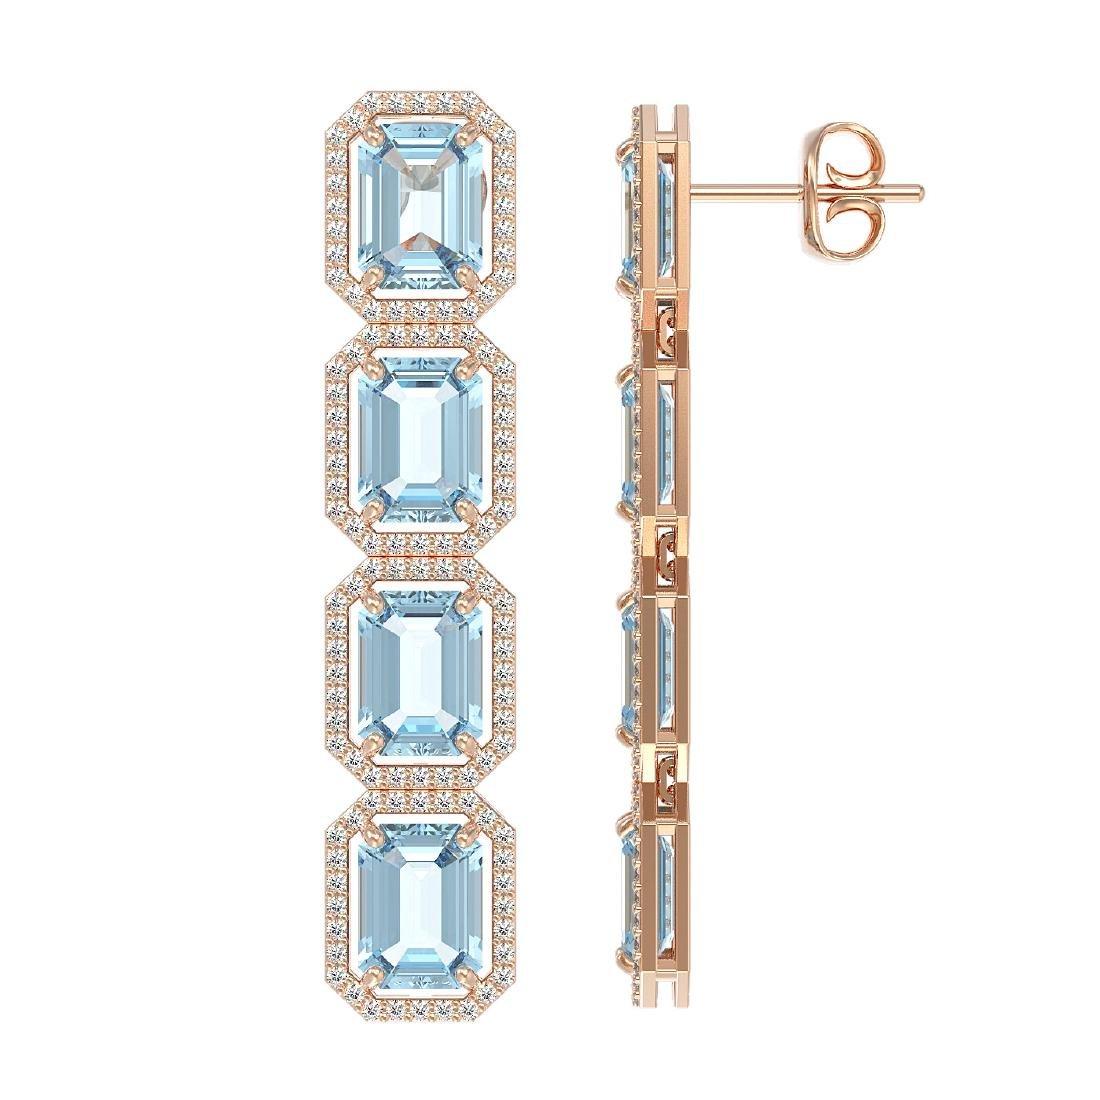 19.49 CTW Aquamarine & Diamond Halo Earrings 10K Rose - 2